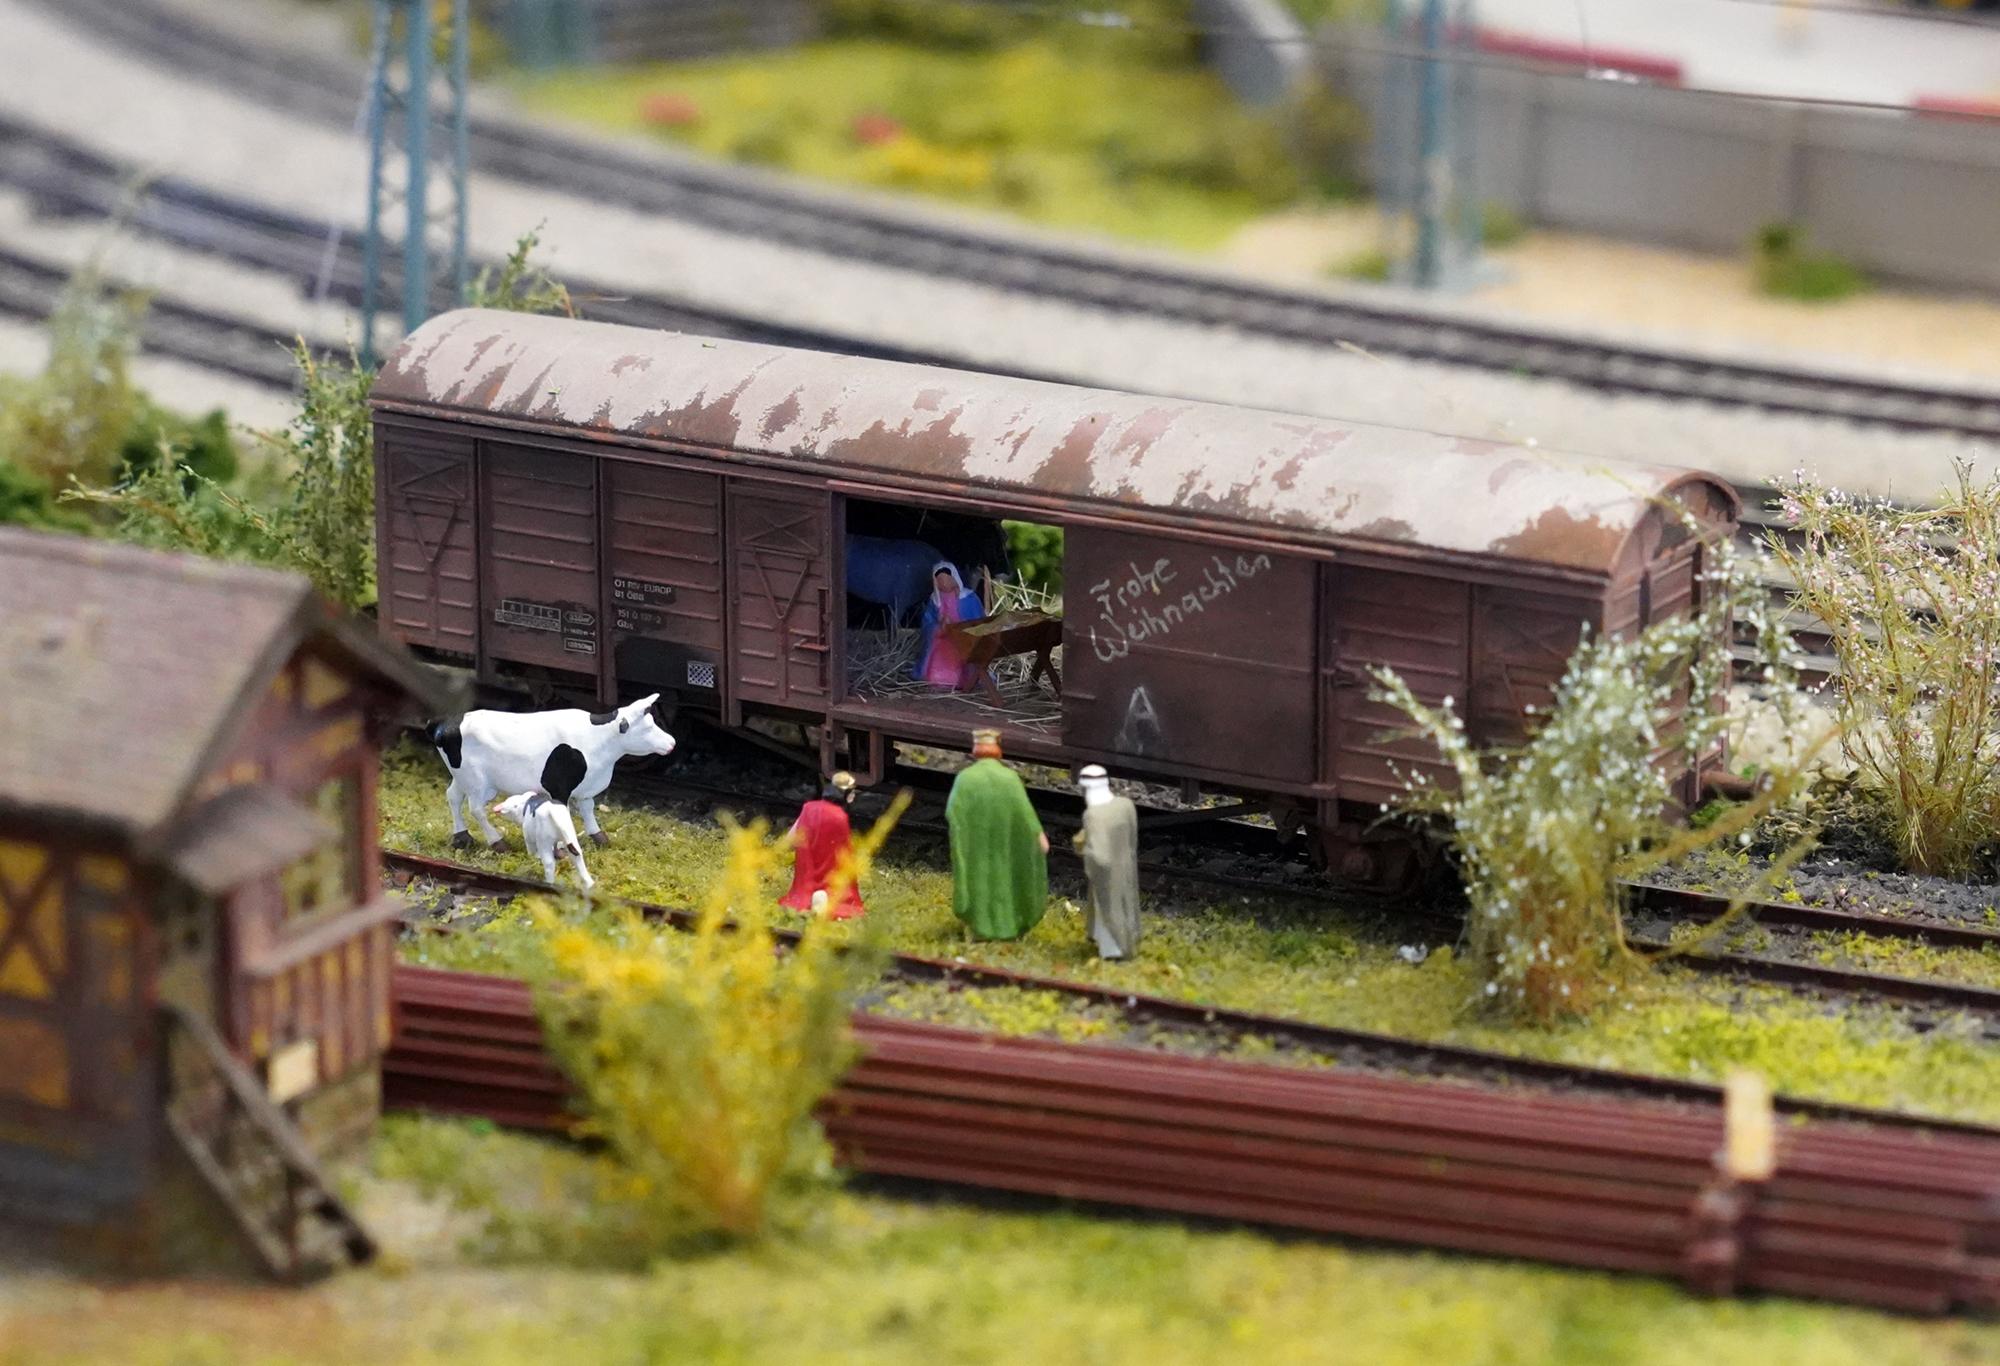 Modellbahn im Advent